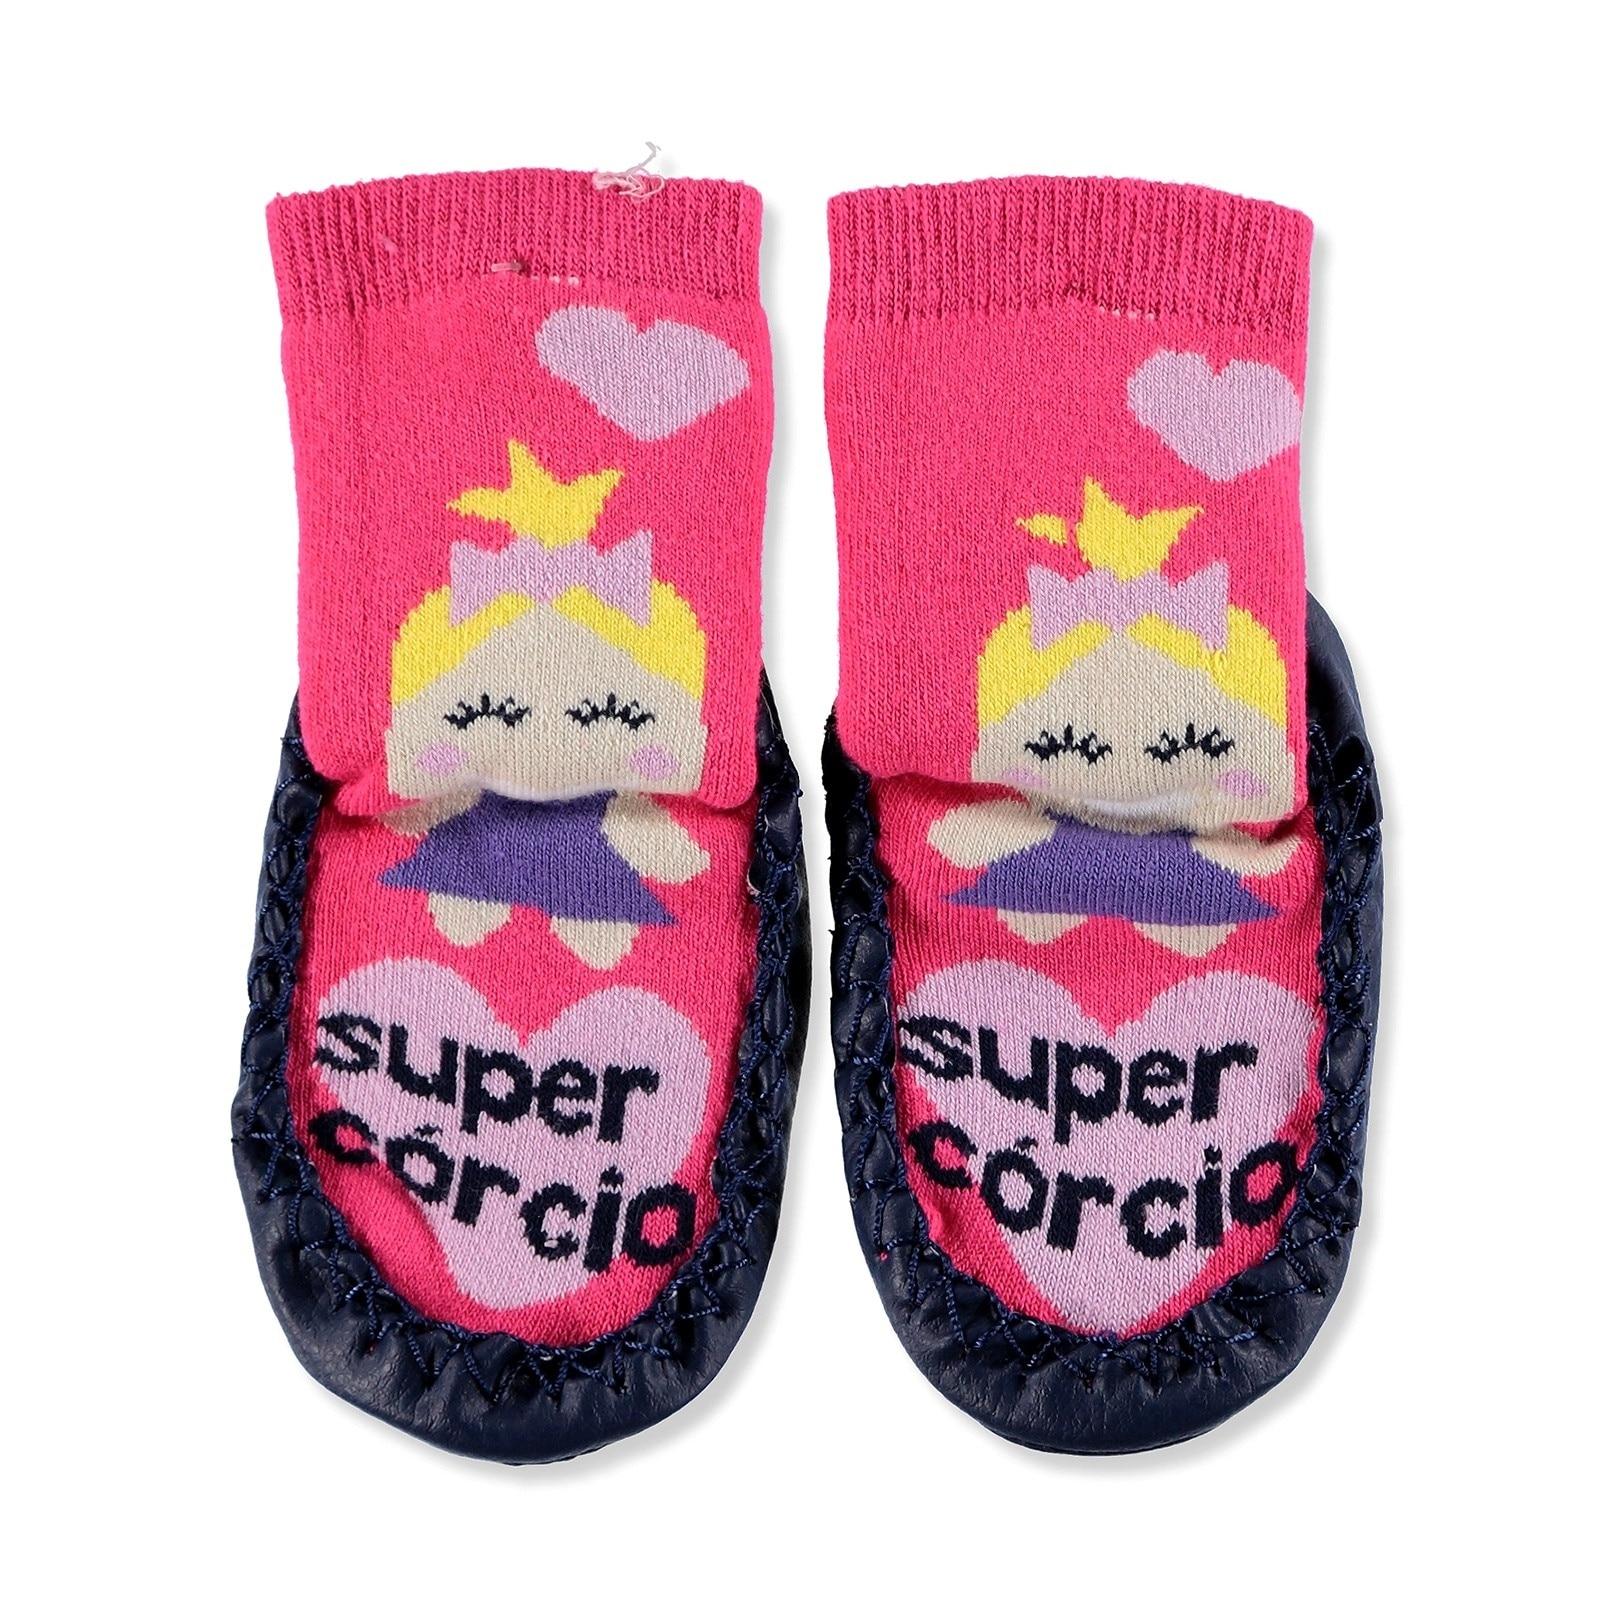 Ebebek HelloBaby Winter Detailed Baby Socks